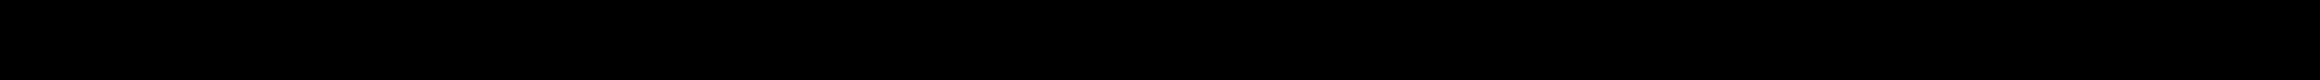 MAHLE ORIGINAL GU01106090, 13 32 1 461 265, 1461265, 16 14 2 325 859, 2325859 Brandstoffilter